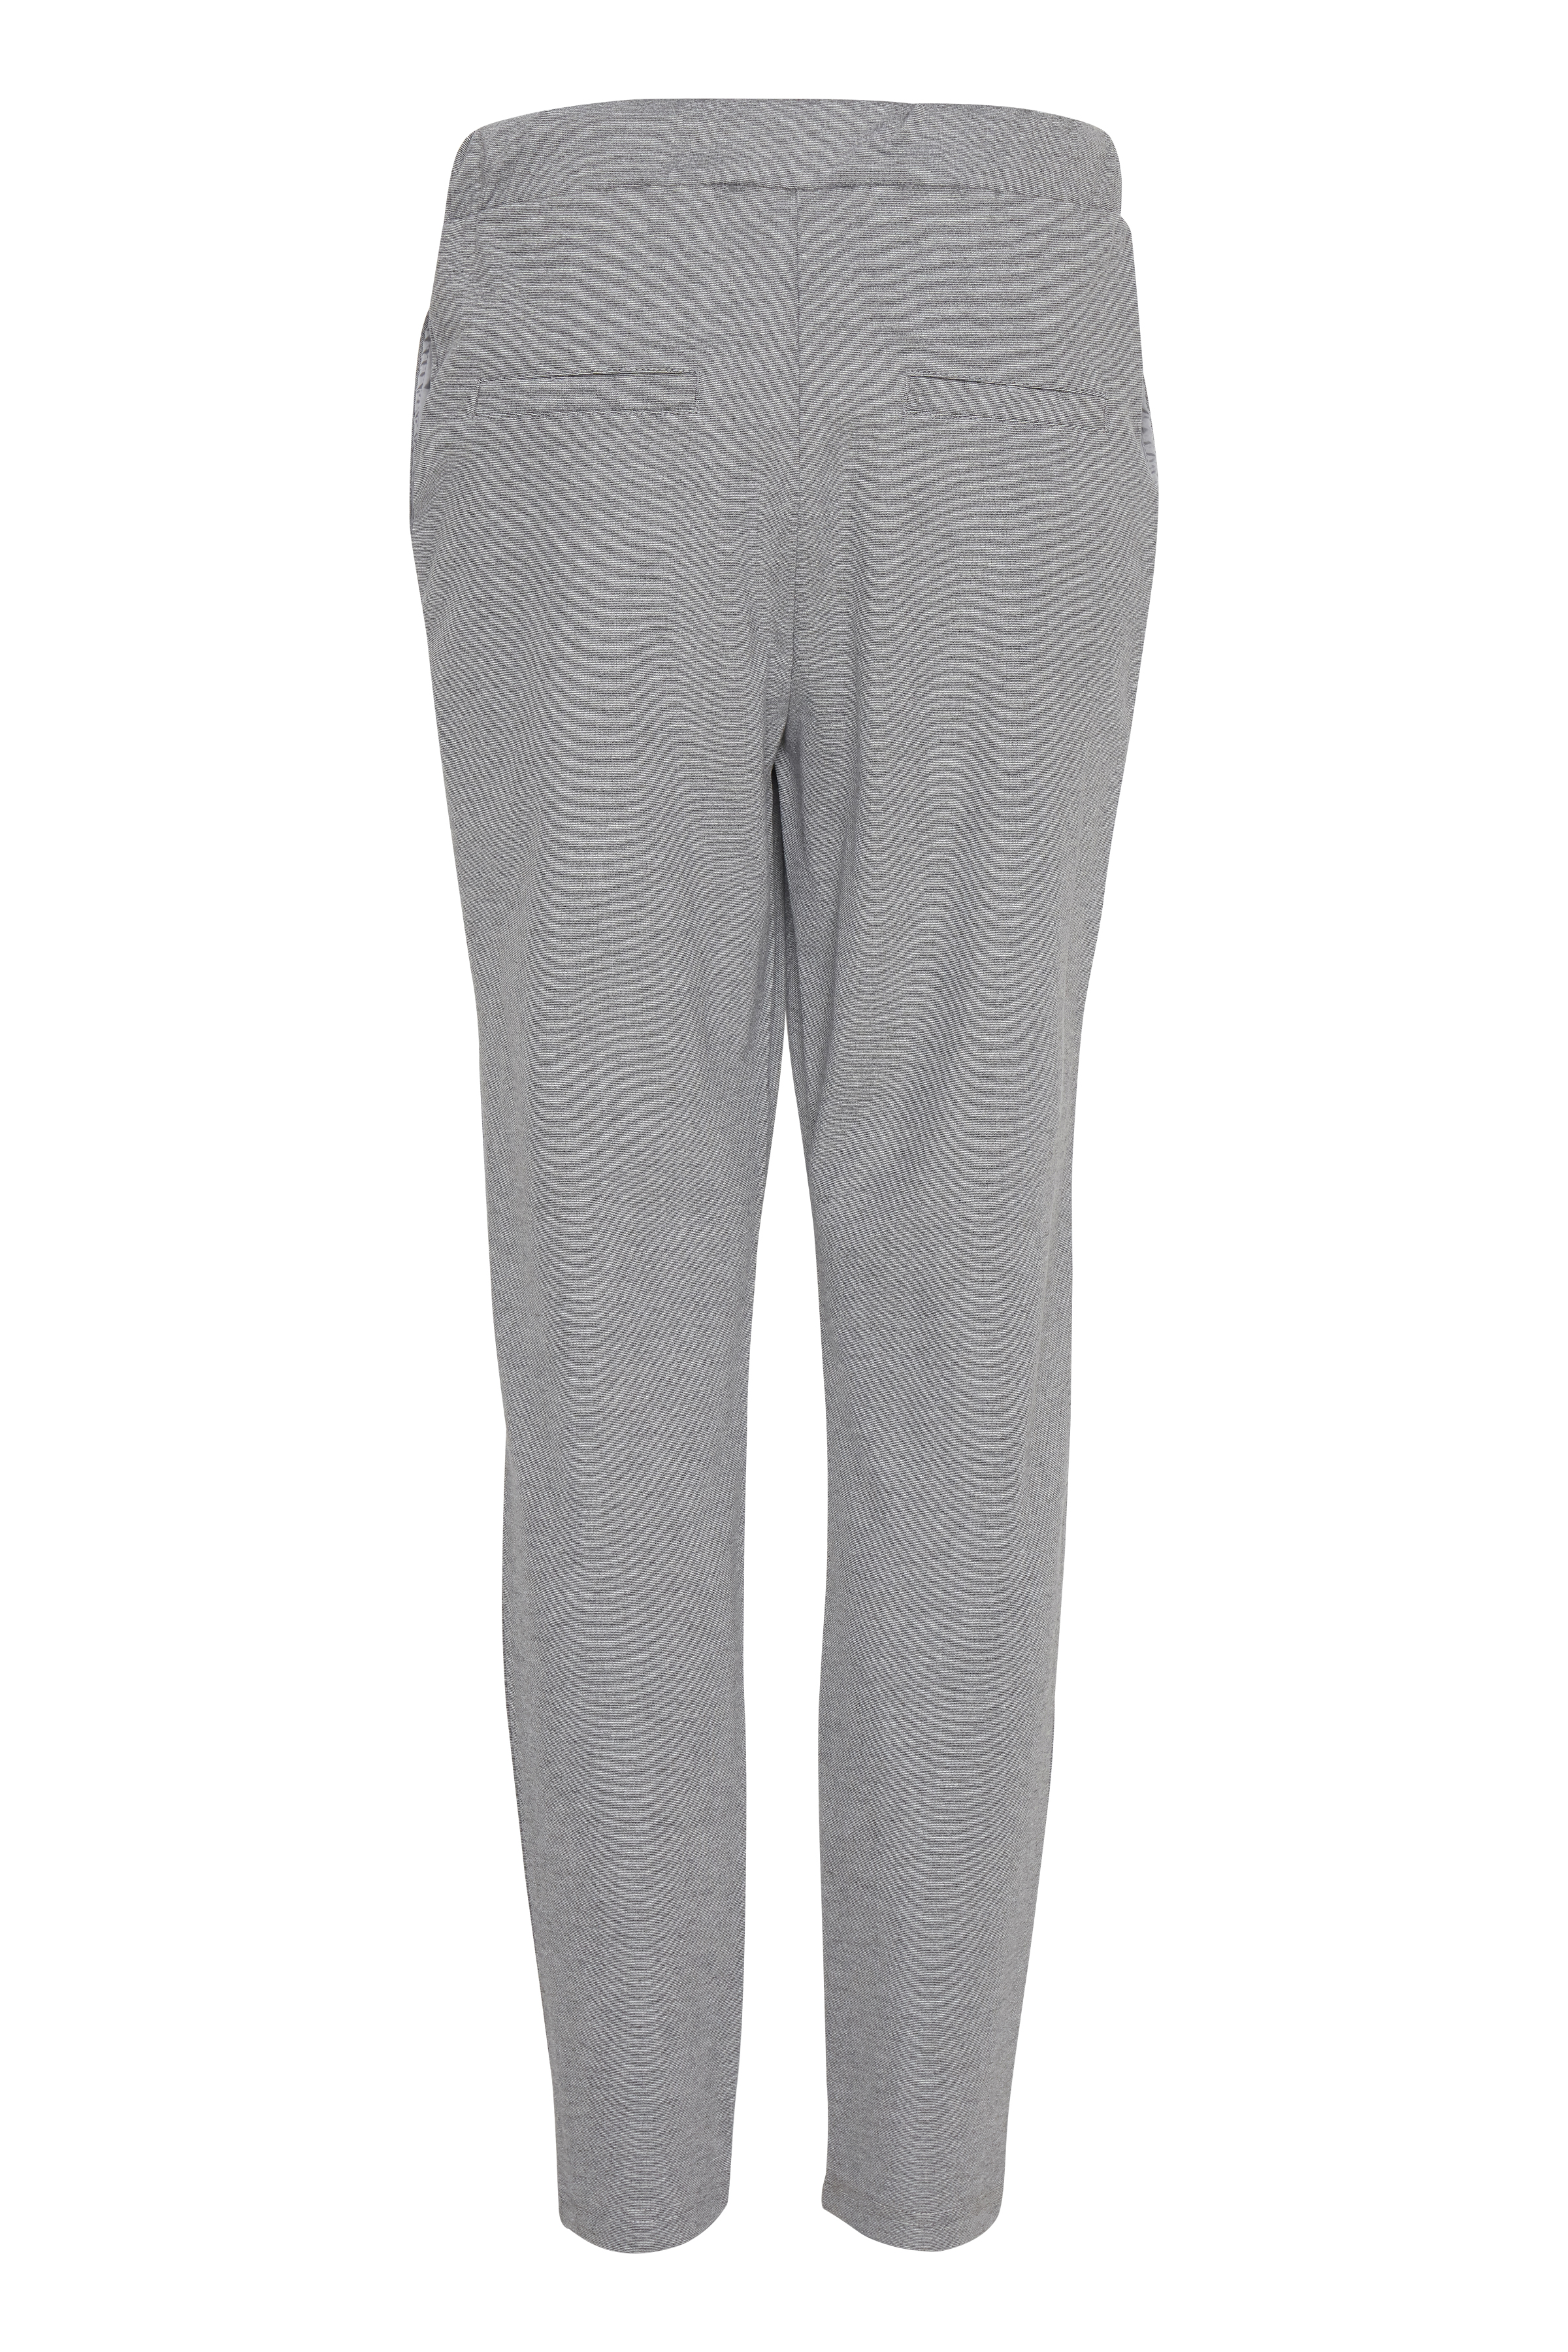 Gråmeleret Casual bukser fra Fransa – Køb Gråmeleret Casual bukser fra str. XS-XXL her